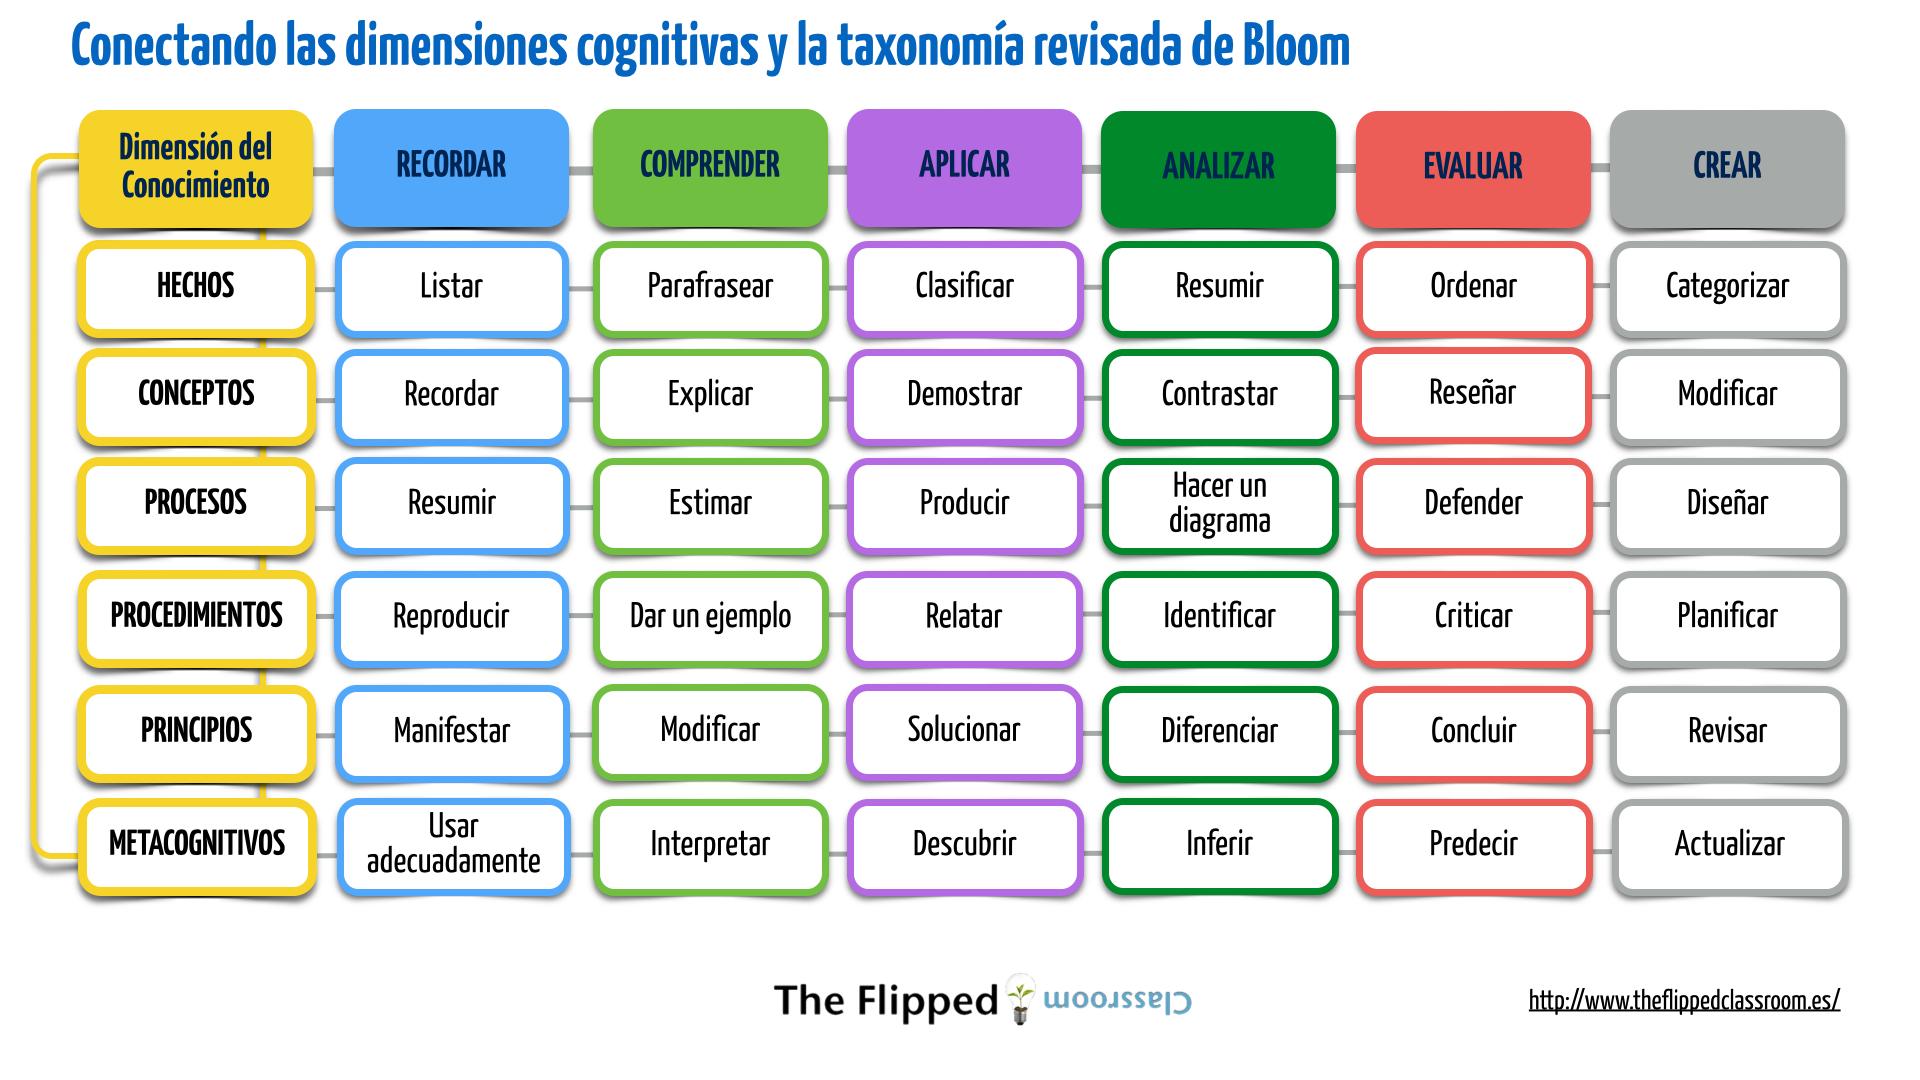 Taxonom a revisada de bloom imagenes educativas for Taxonomia de la jirafa